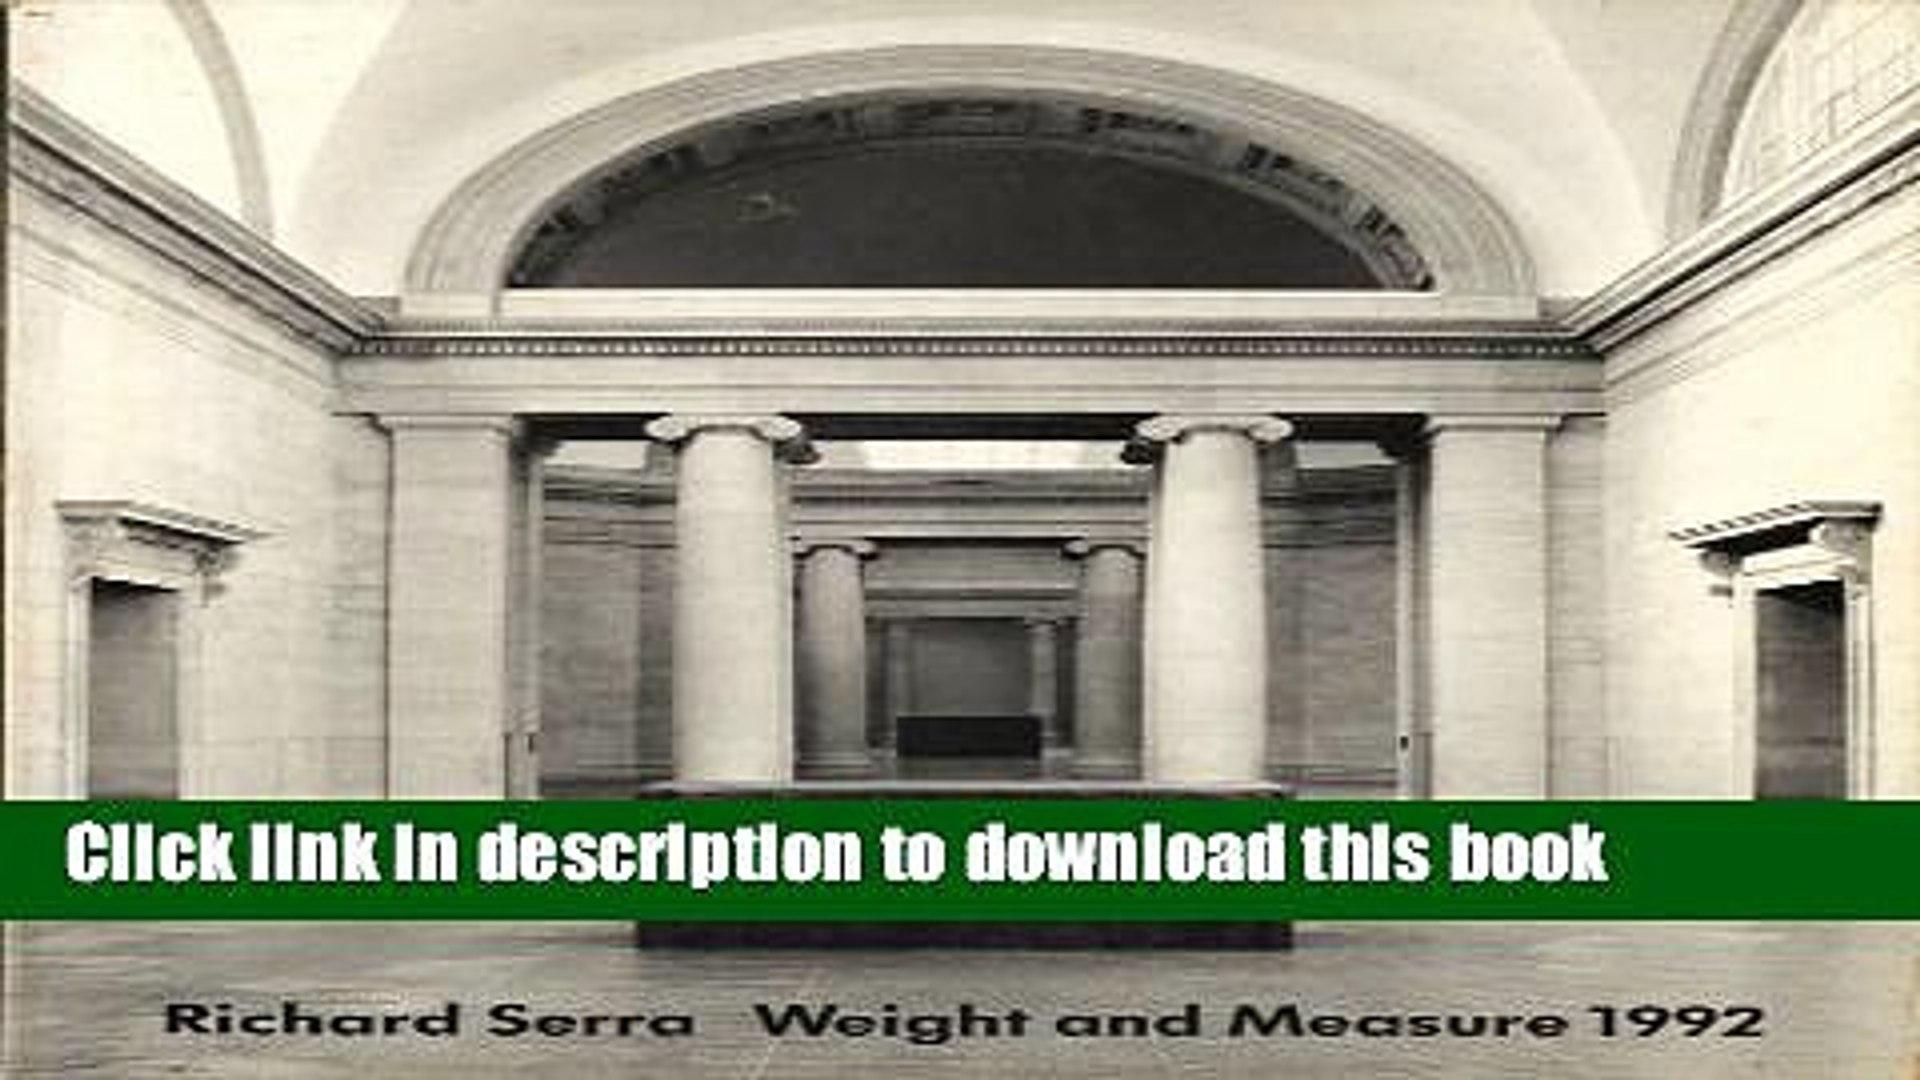 Read Book Richard Serra: Weight and Measure 1992 : 30 September 1992-15 January 1993 E-Book Free